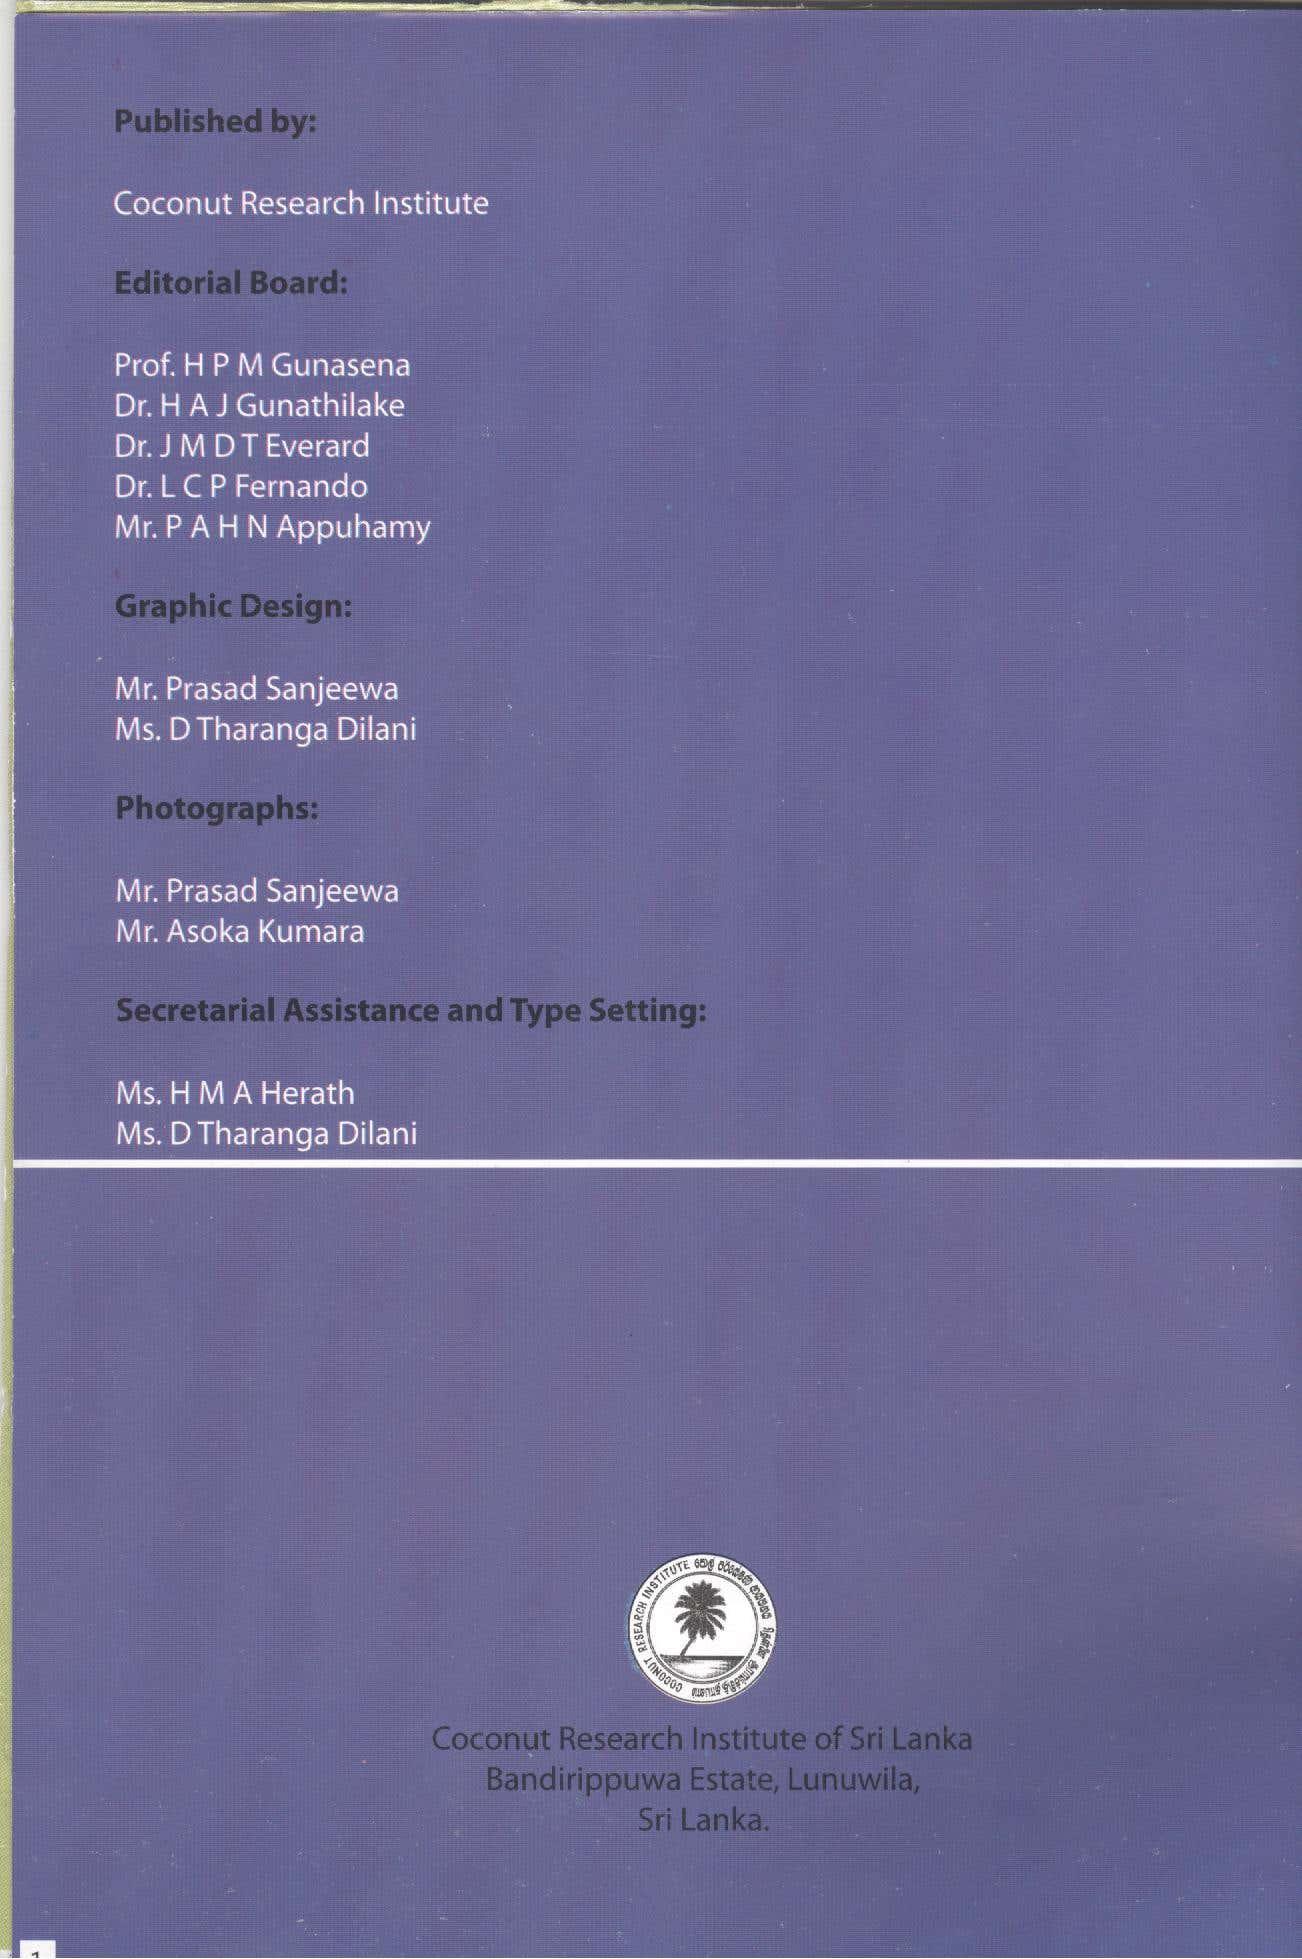 Guide Book of the Institute